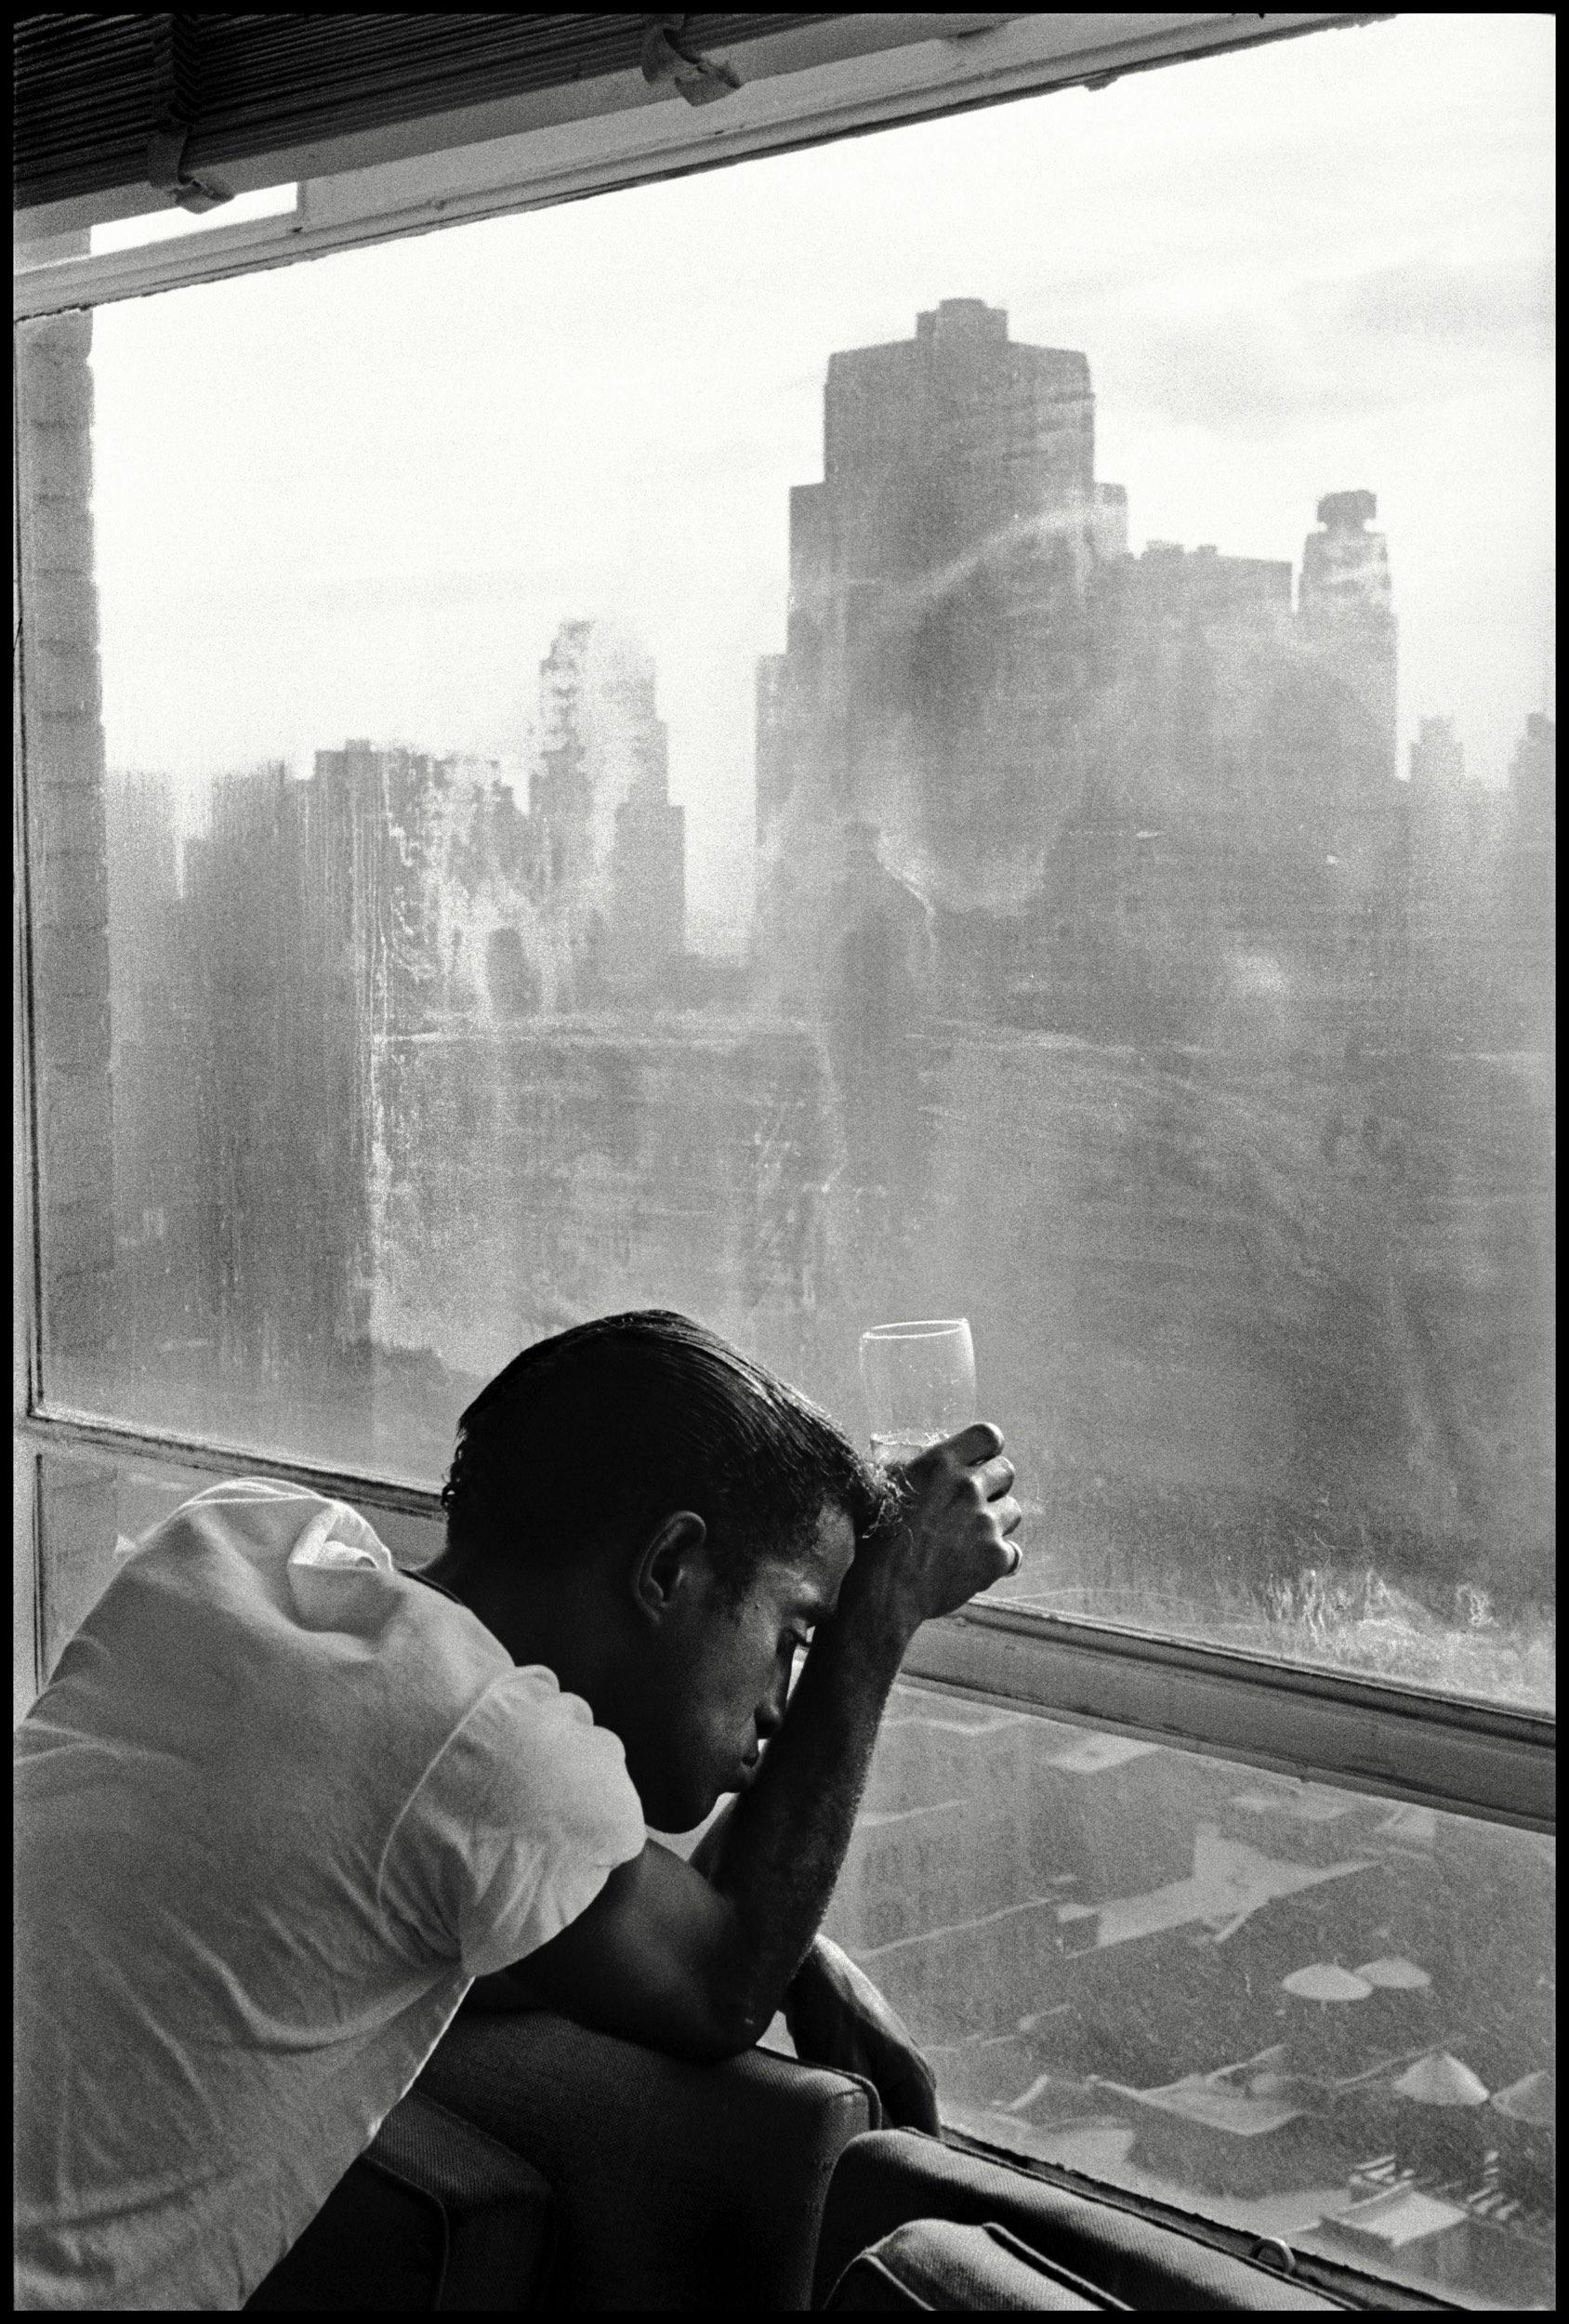 USA. New York City. 1959. Sammy DAVIS Jr. looks out a Manhattan window. Photo by Burt Glinn.